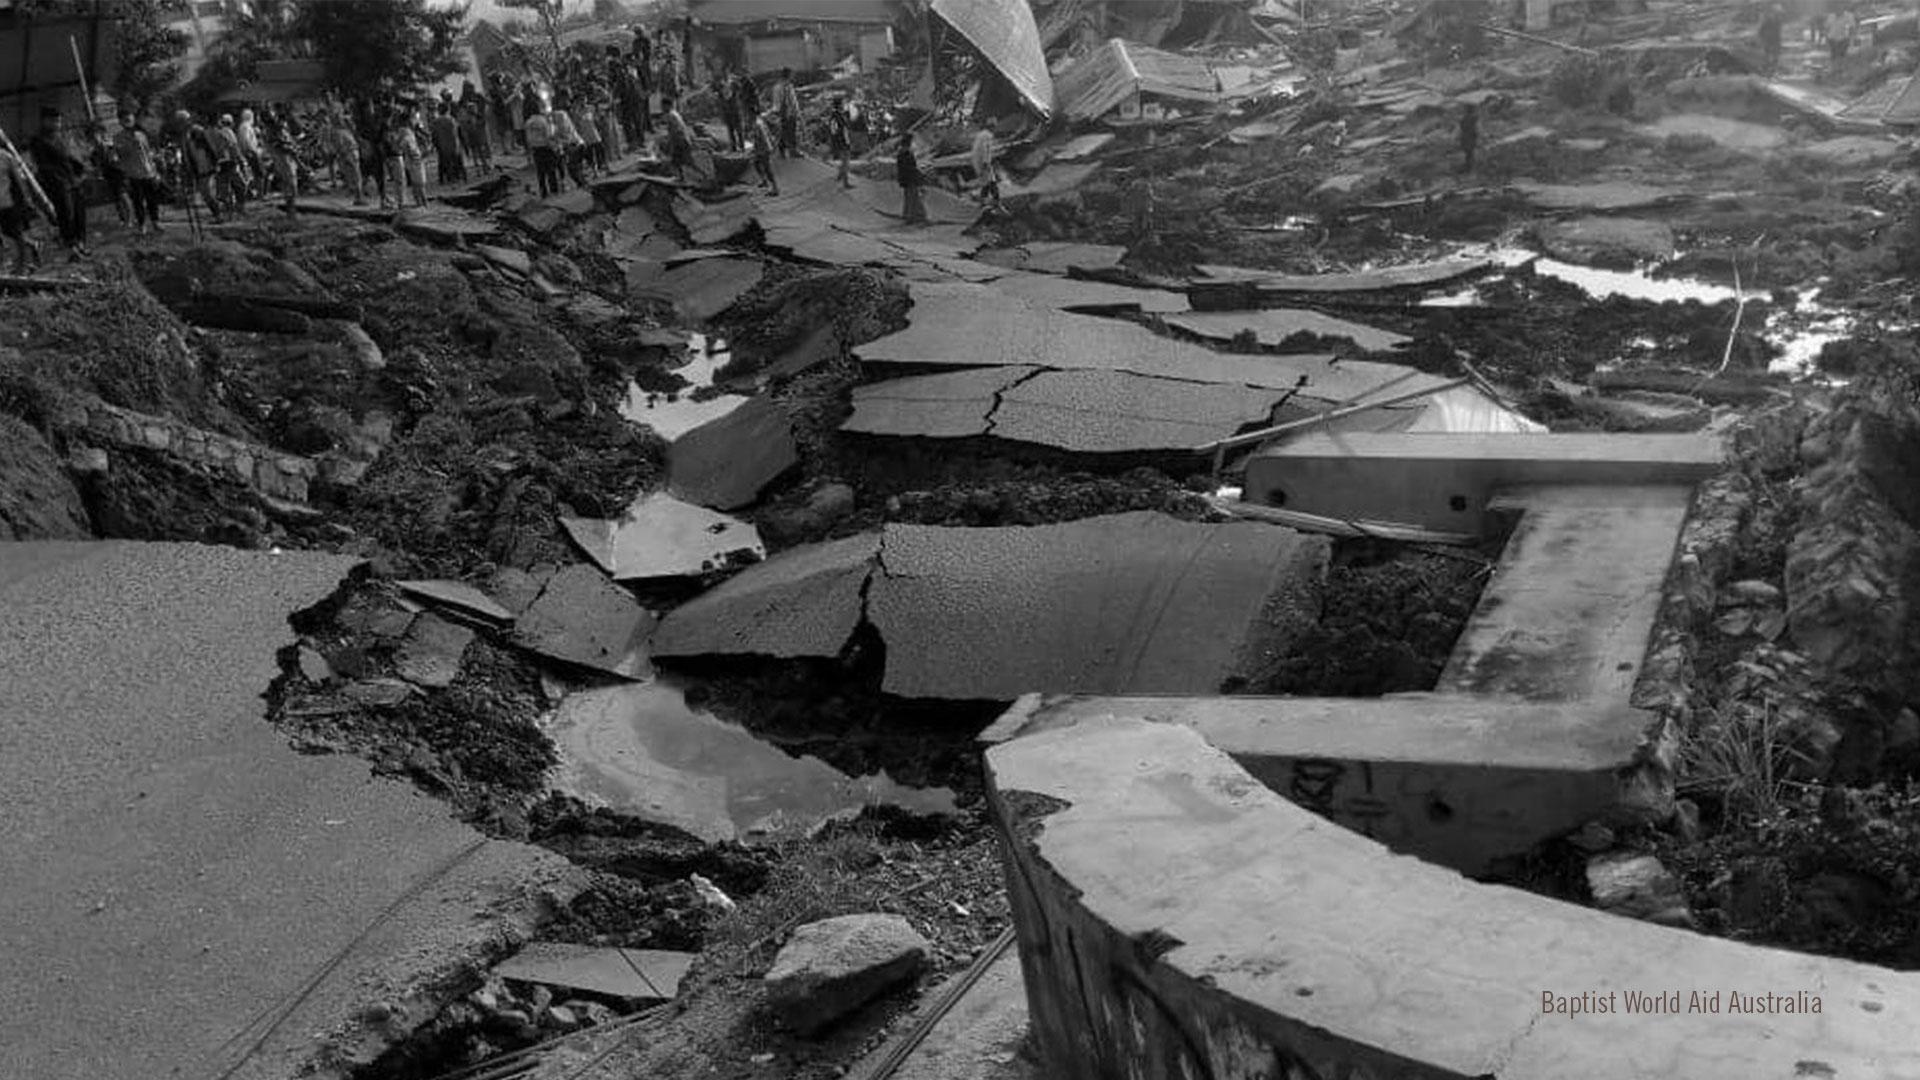 Emergency Response: Indonesia Earthquake and Tsunami 2018